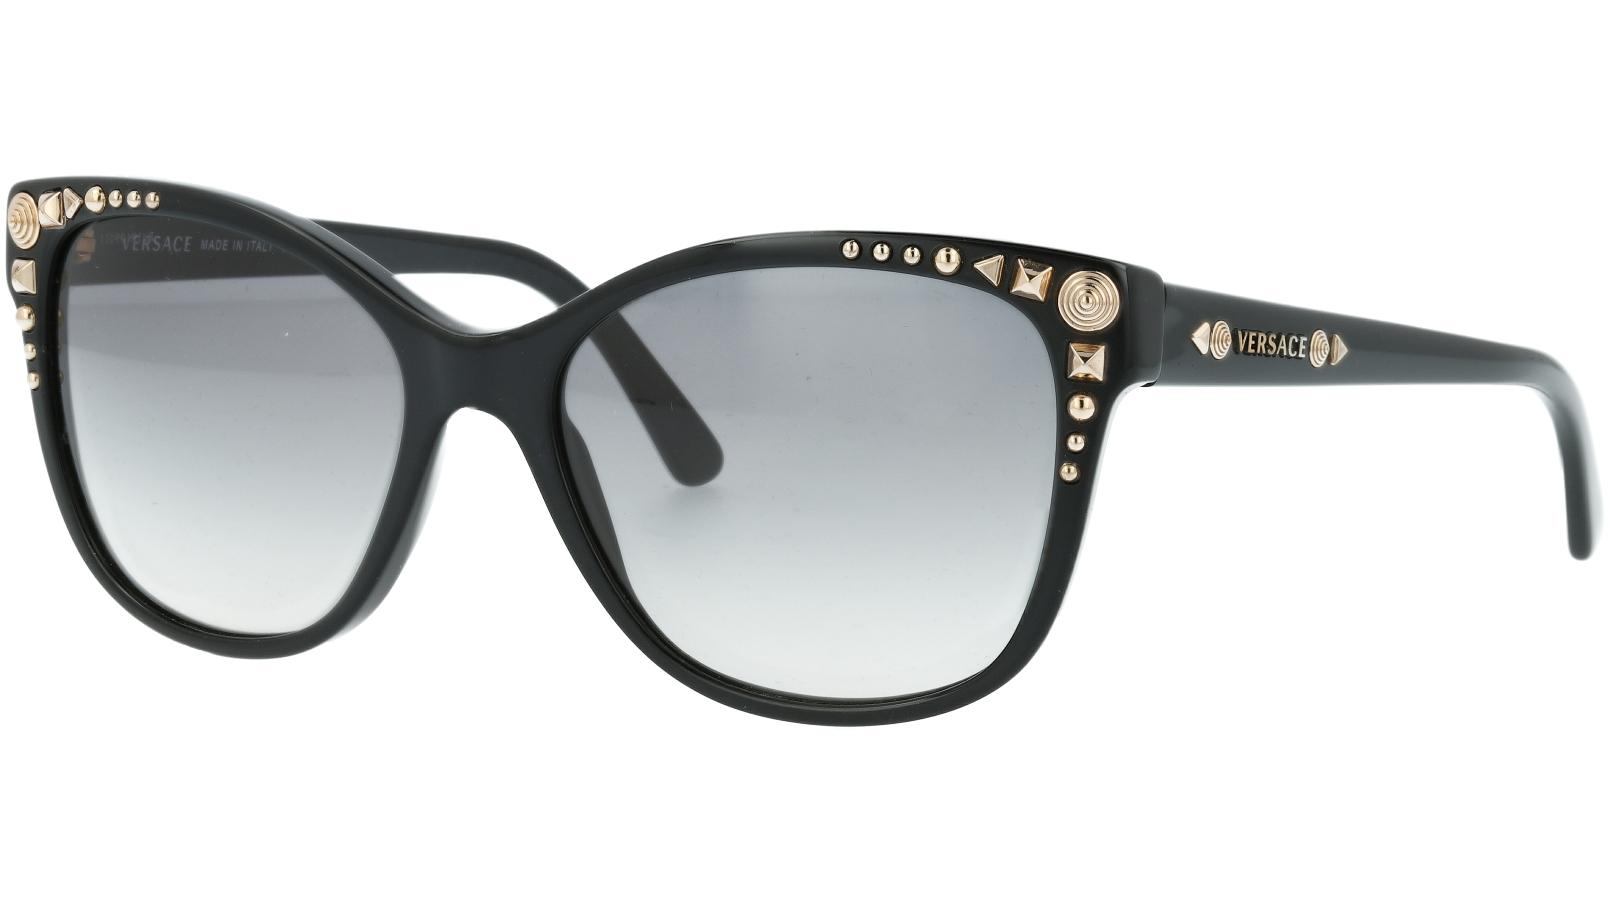 Versace VE4270 GB1/11 56 Black Sunglasses